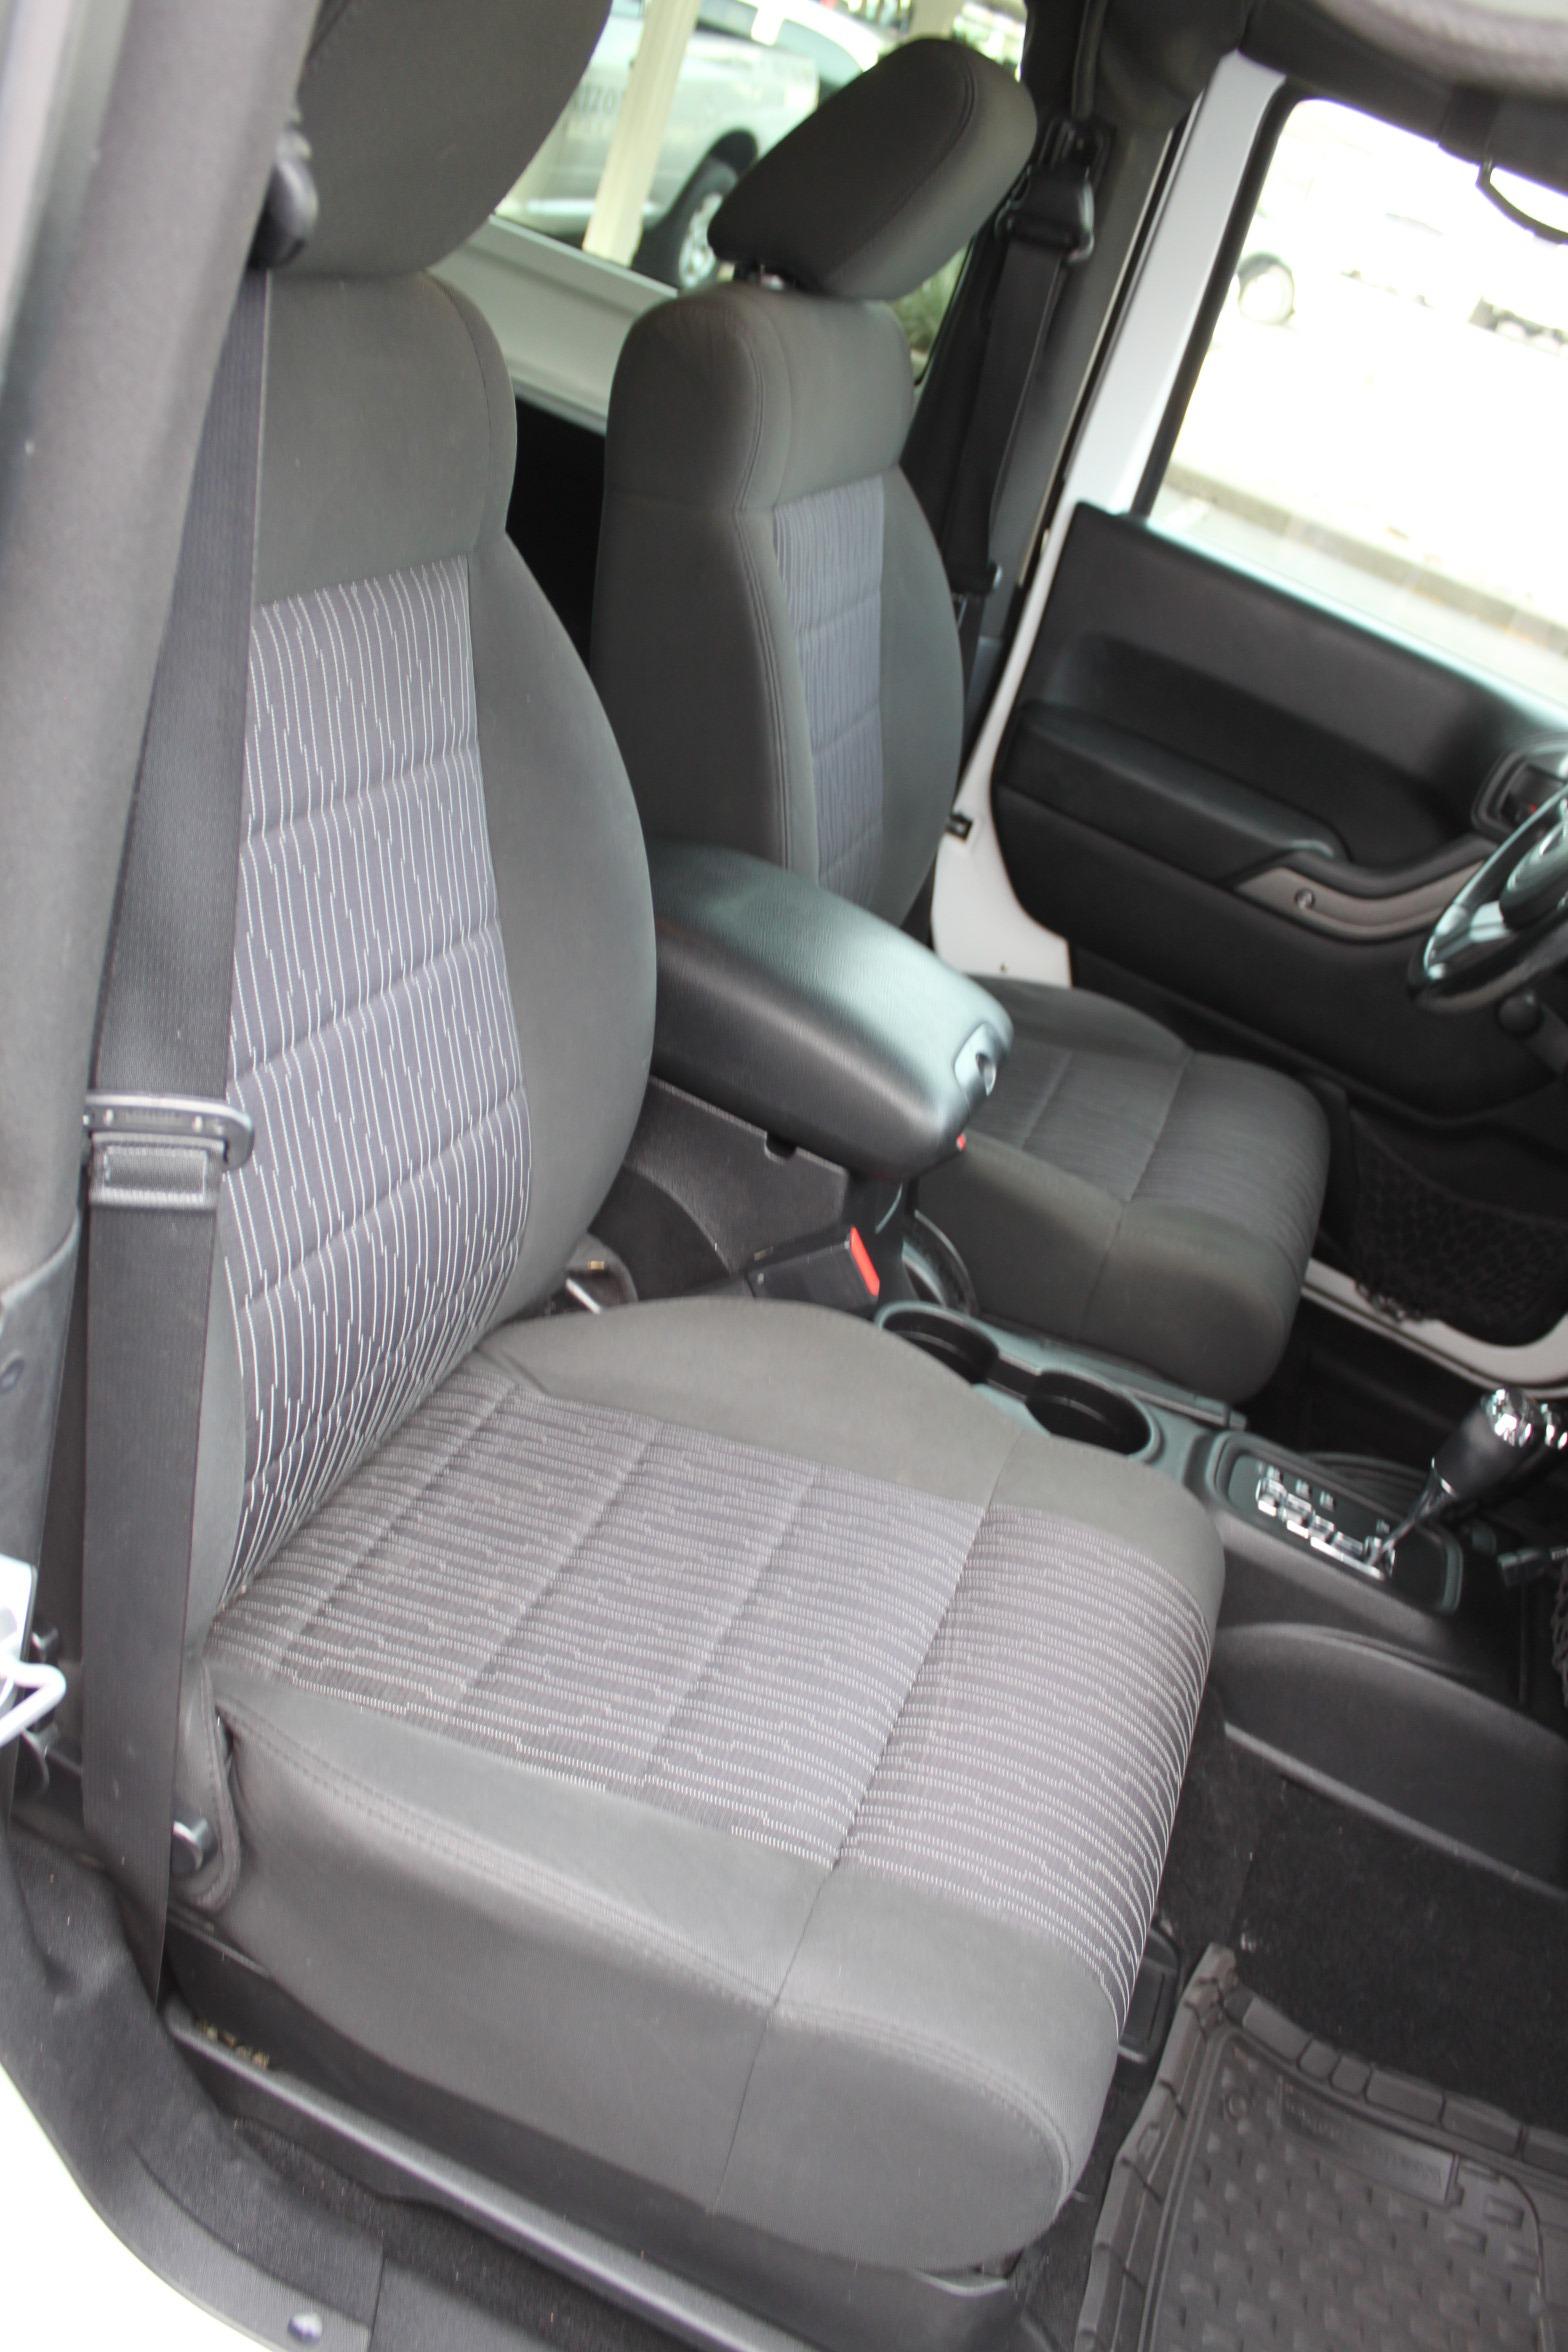 Used-2012-Jeep-Wrangler-Freedom-Edition-4X4-Grand-Wagoneer